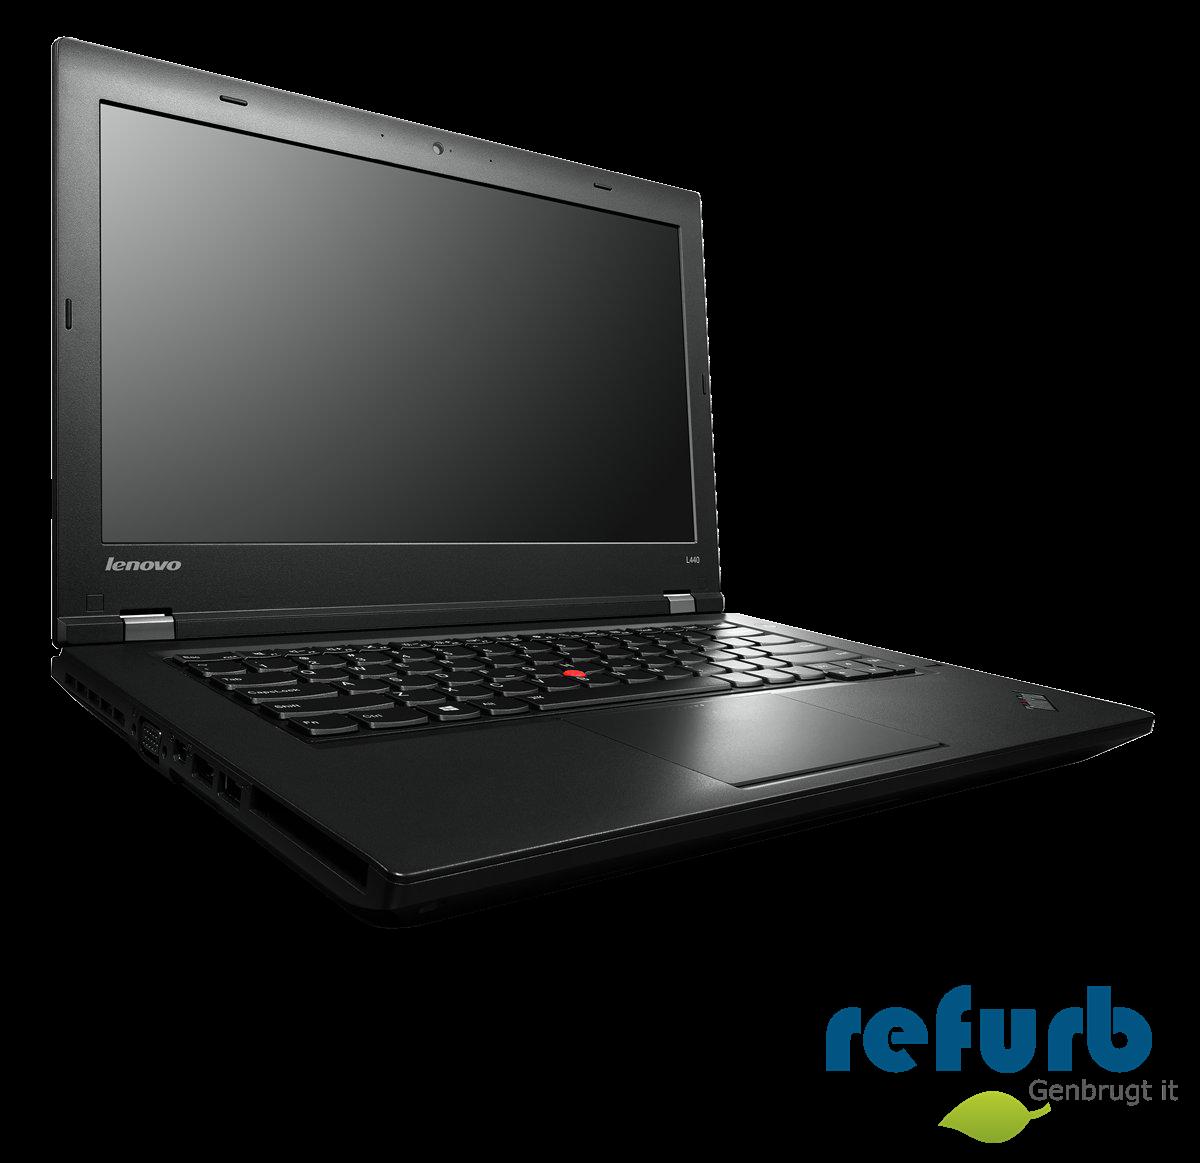 Lenovo – Lenovo thinkpad l440 på refurb